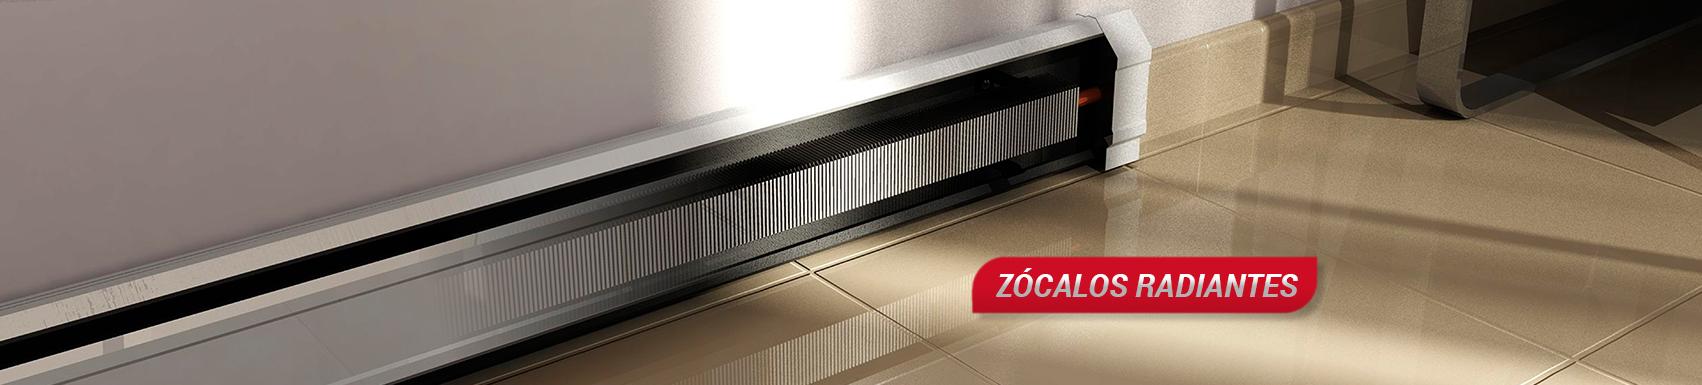 Microzoc calefacci n por agua con z calos radiantes - Chimeneas para calefaccion por agua ...